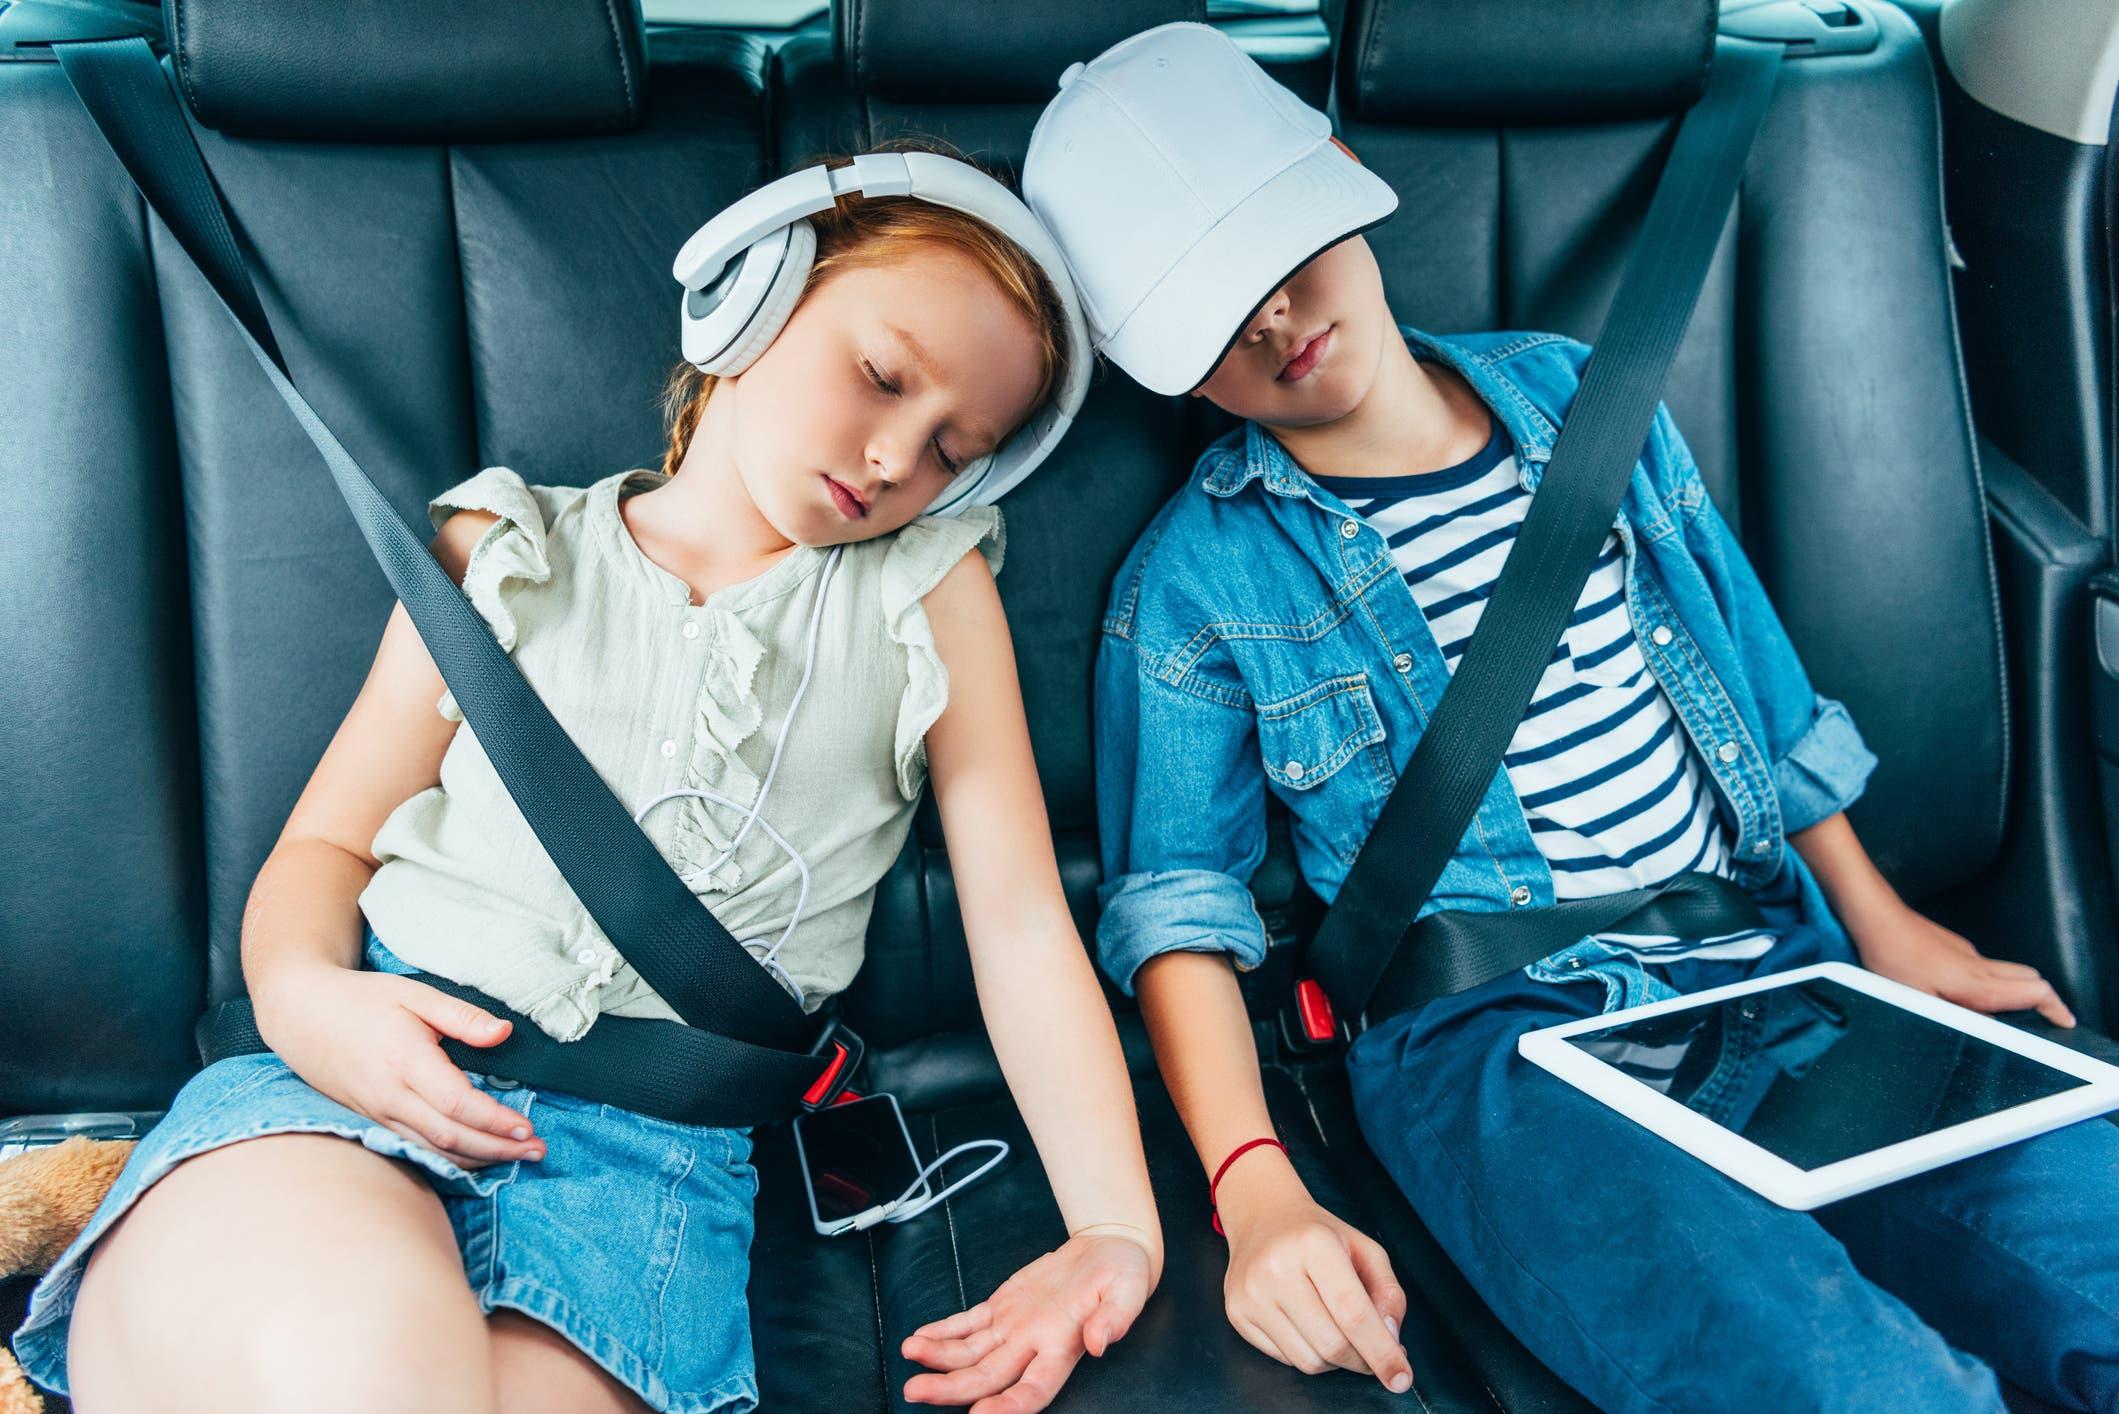 Kids Sleeping On Backseats Of Car